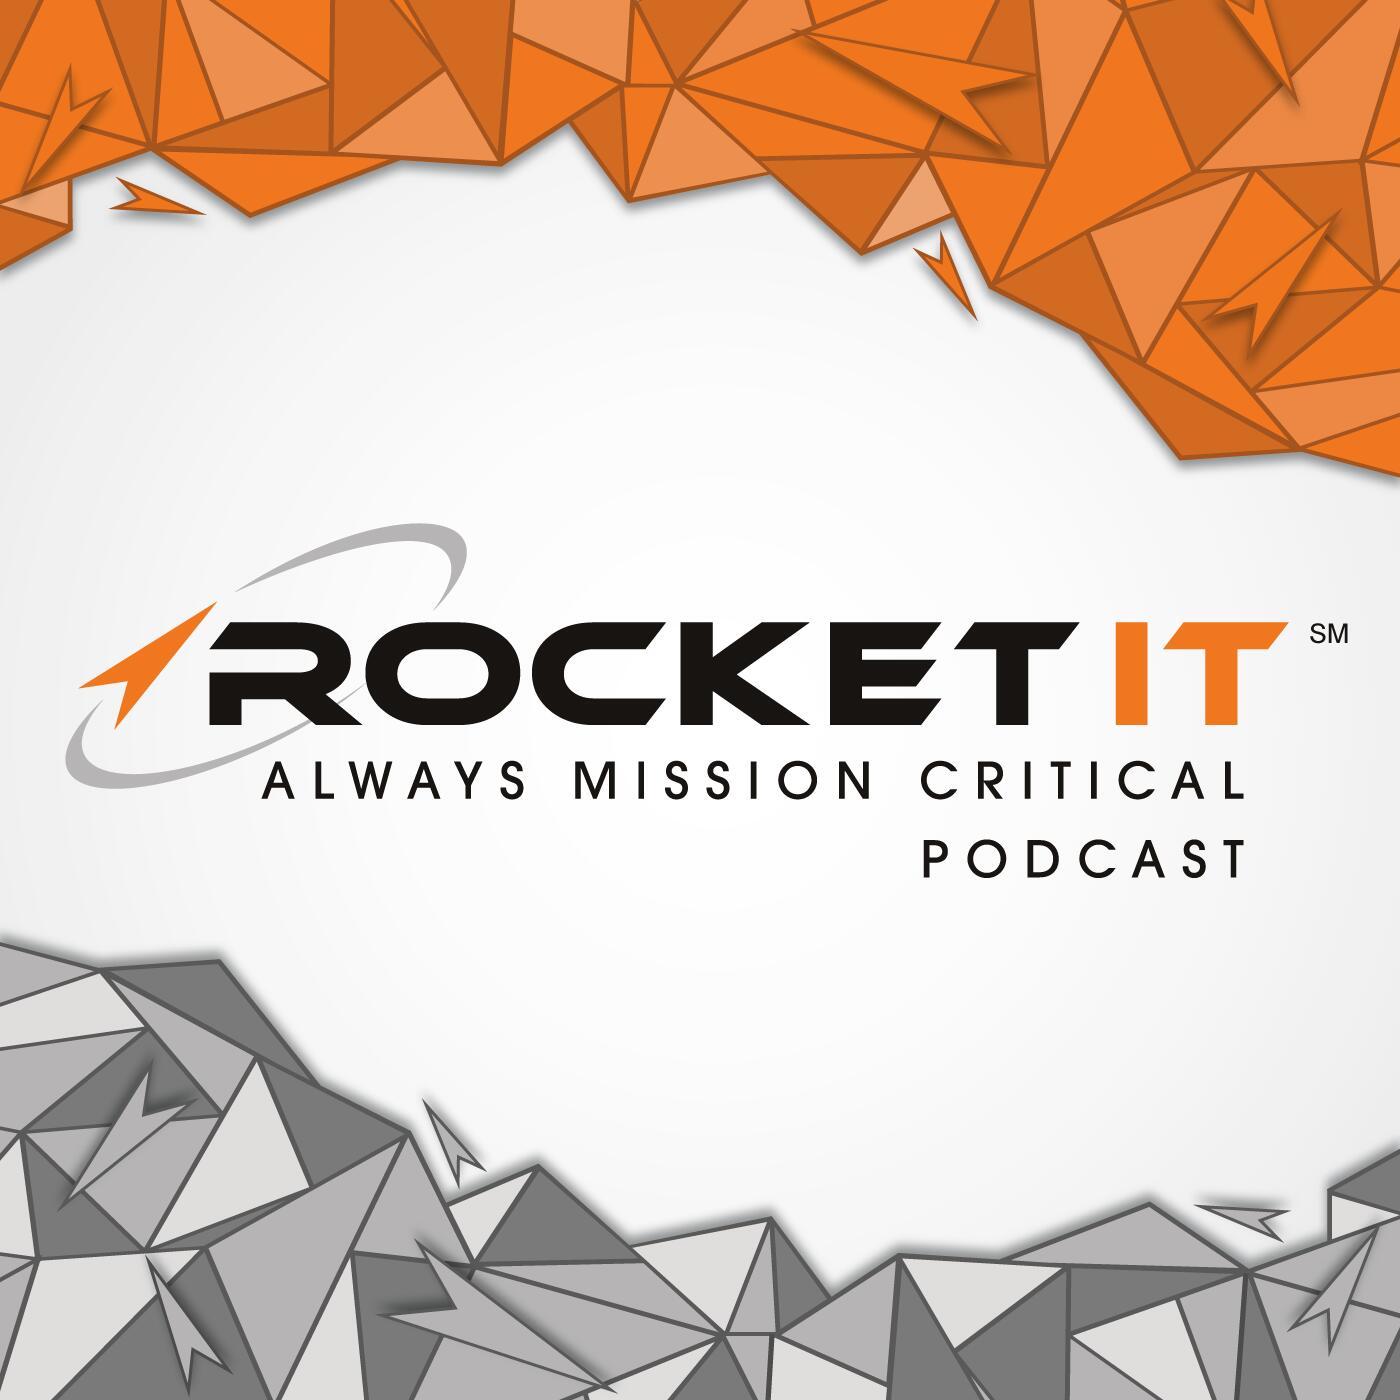 Rocket IT Podcast